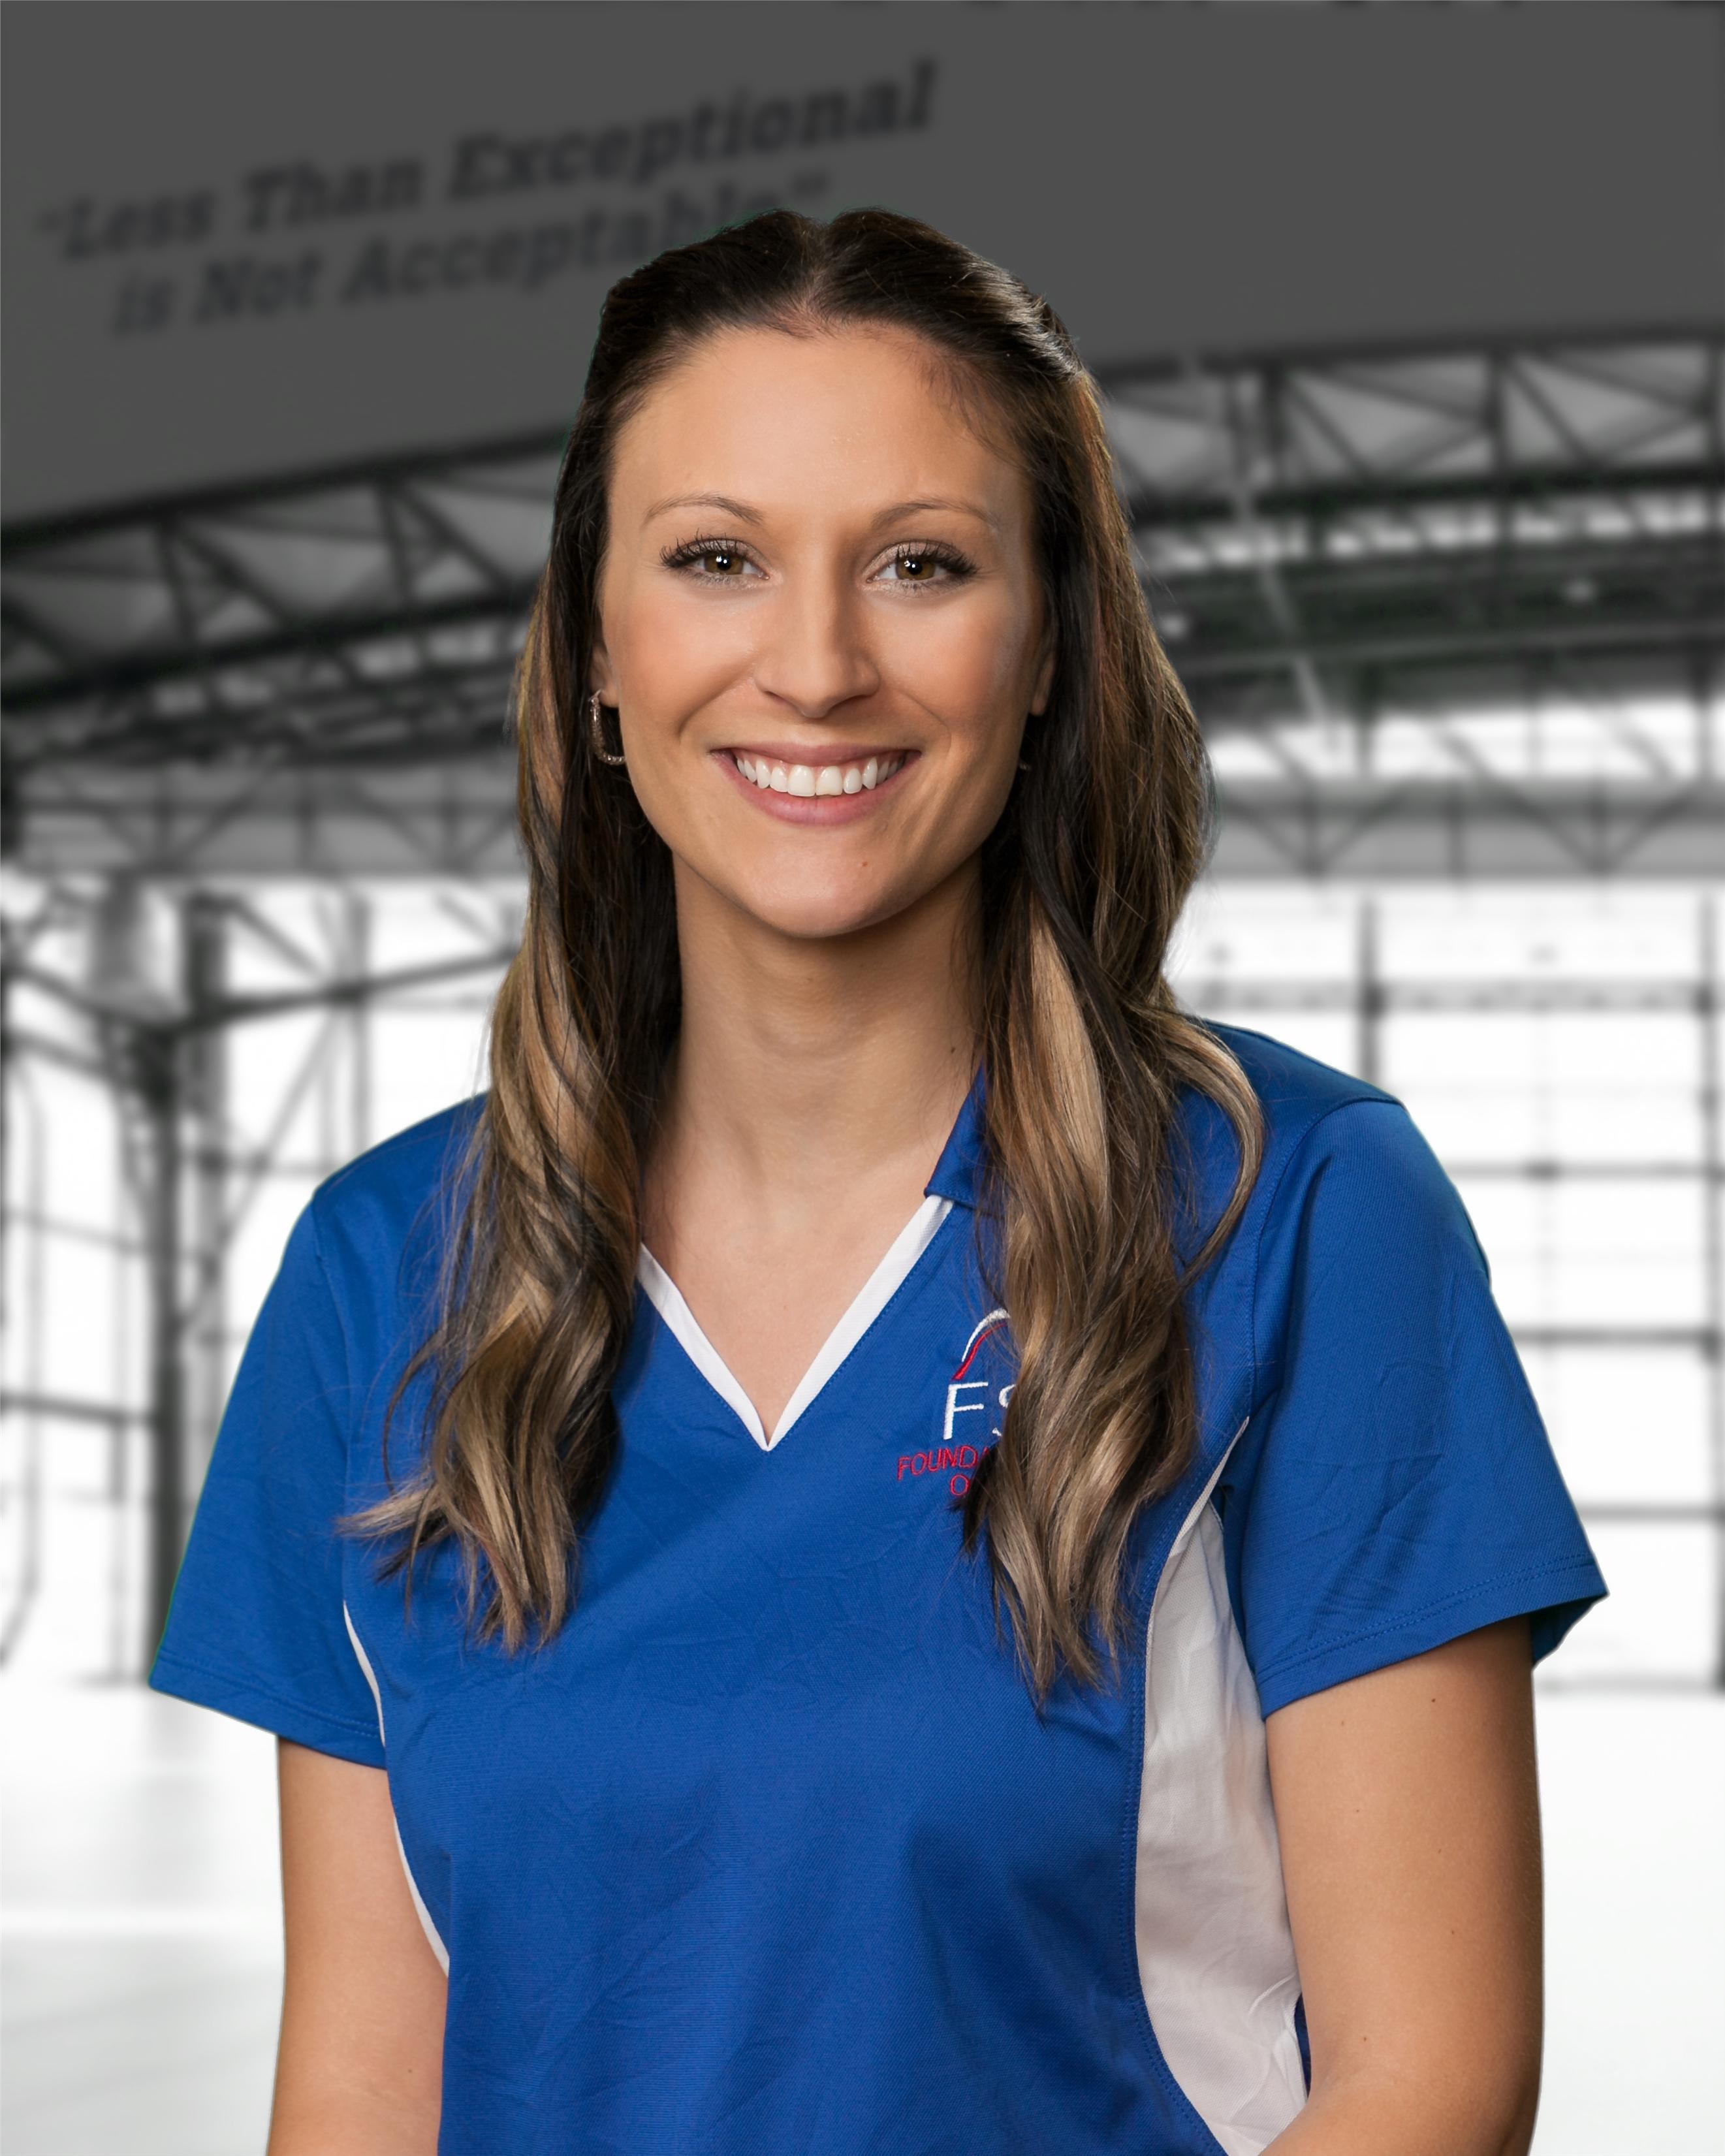 FSM Julie Genord Appointment Center Manager